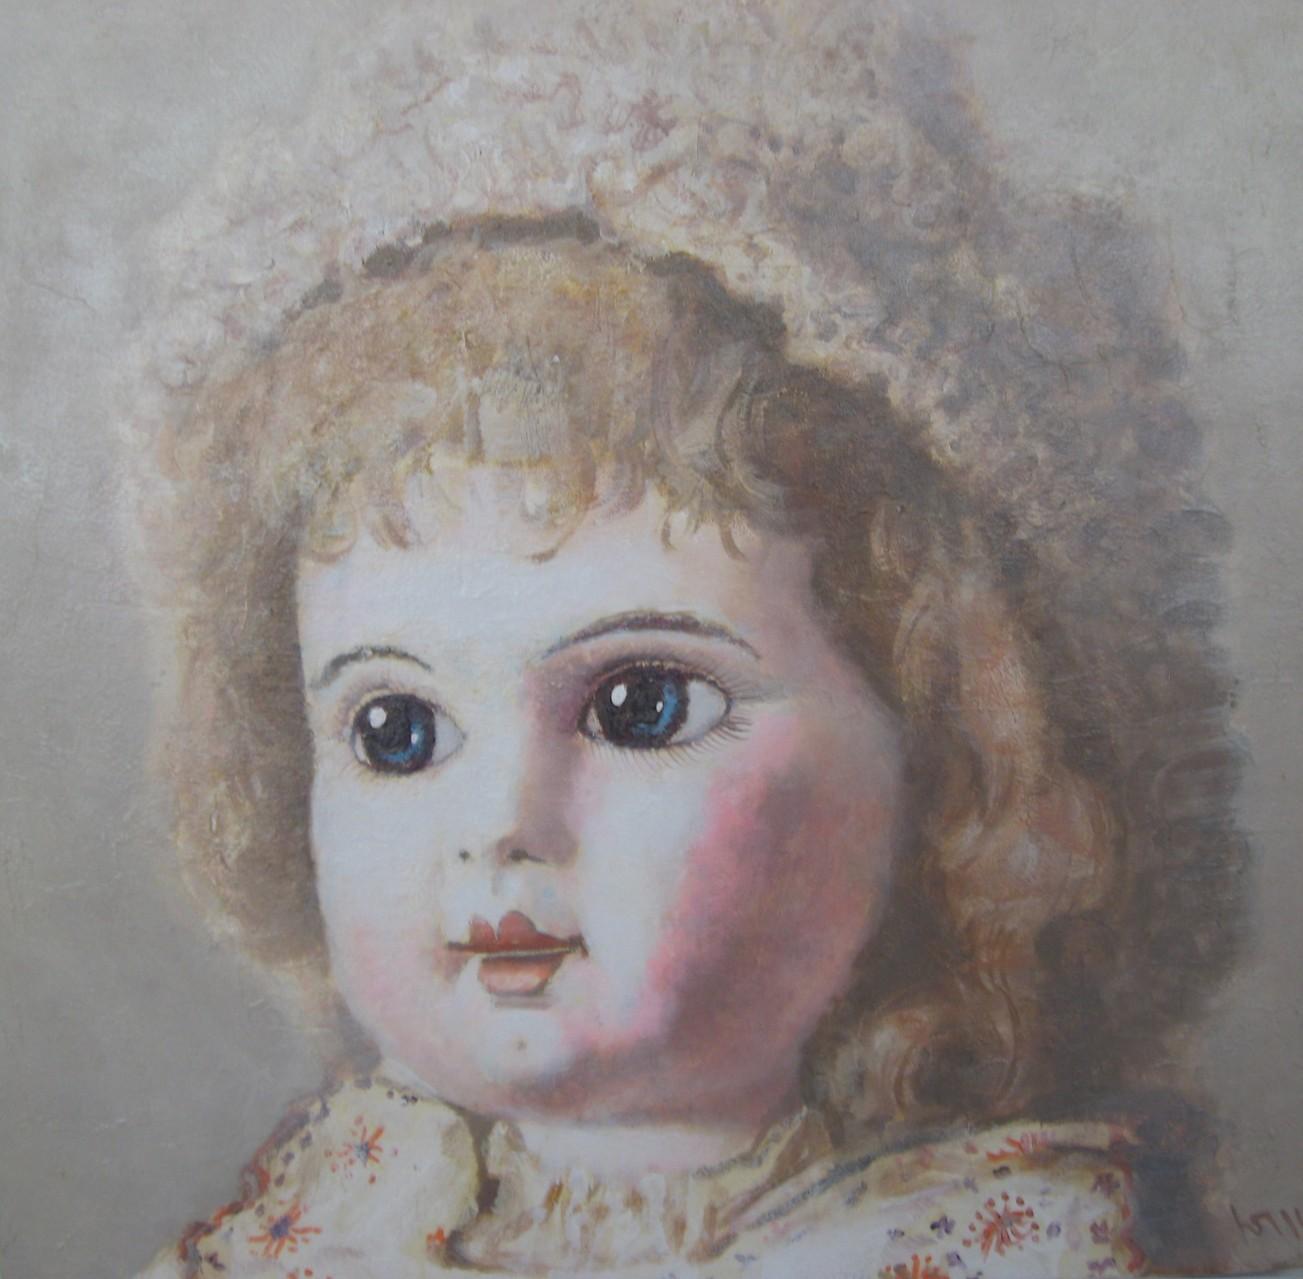 Юрий Первушин.     Кукла 3.   (Сер. «Старинные куклы»).     2014 г.    Холст, акрил.  60х60 см.